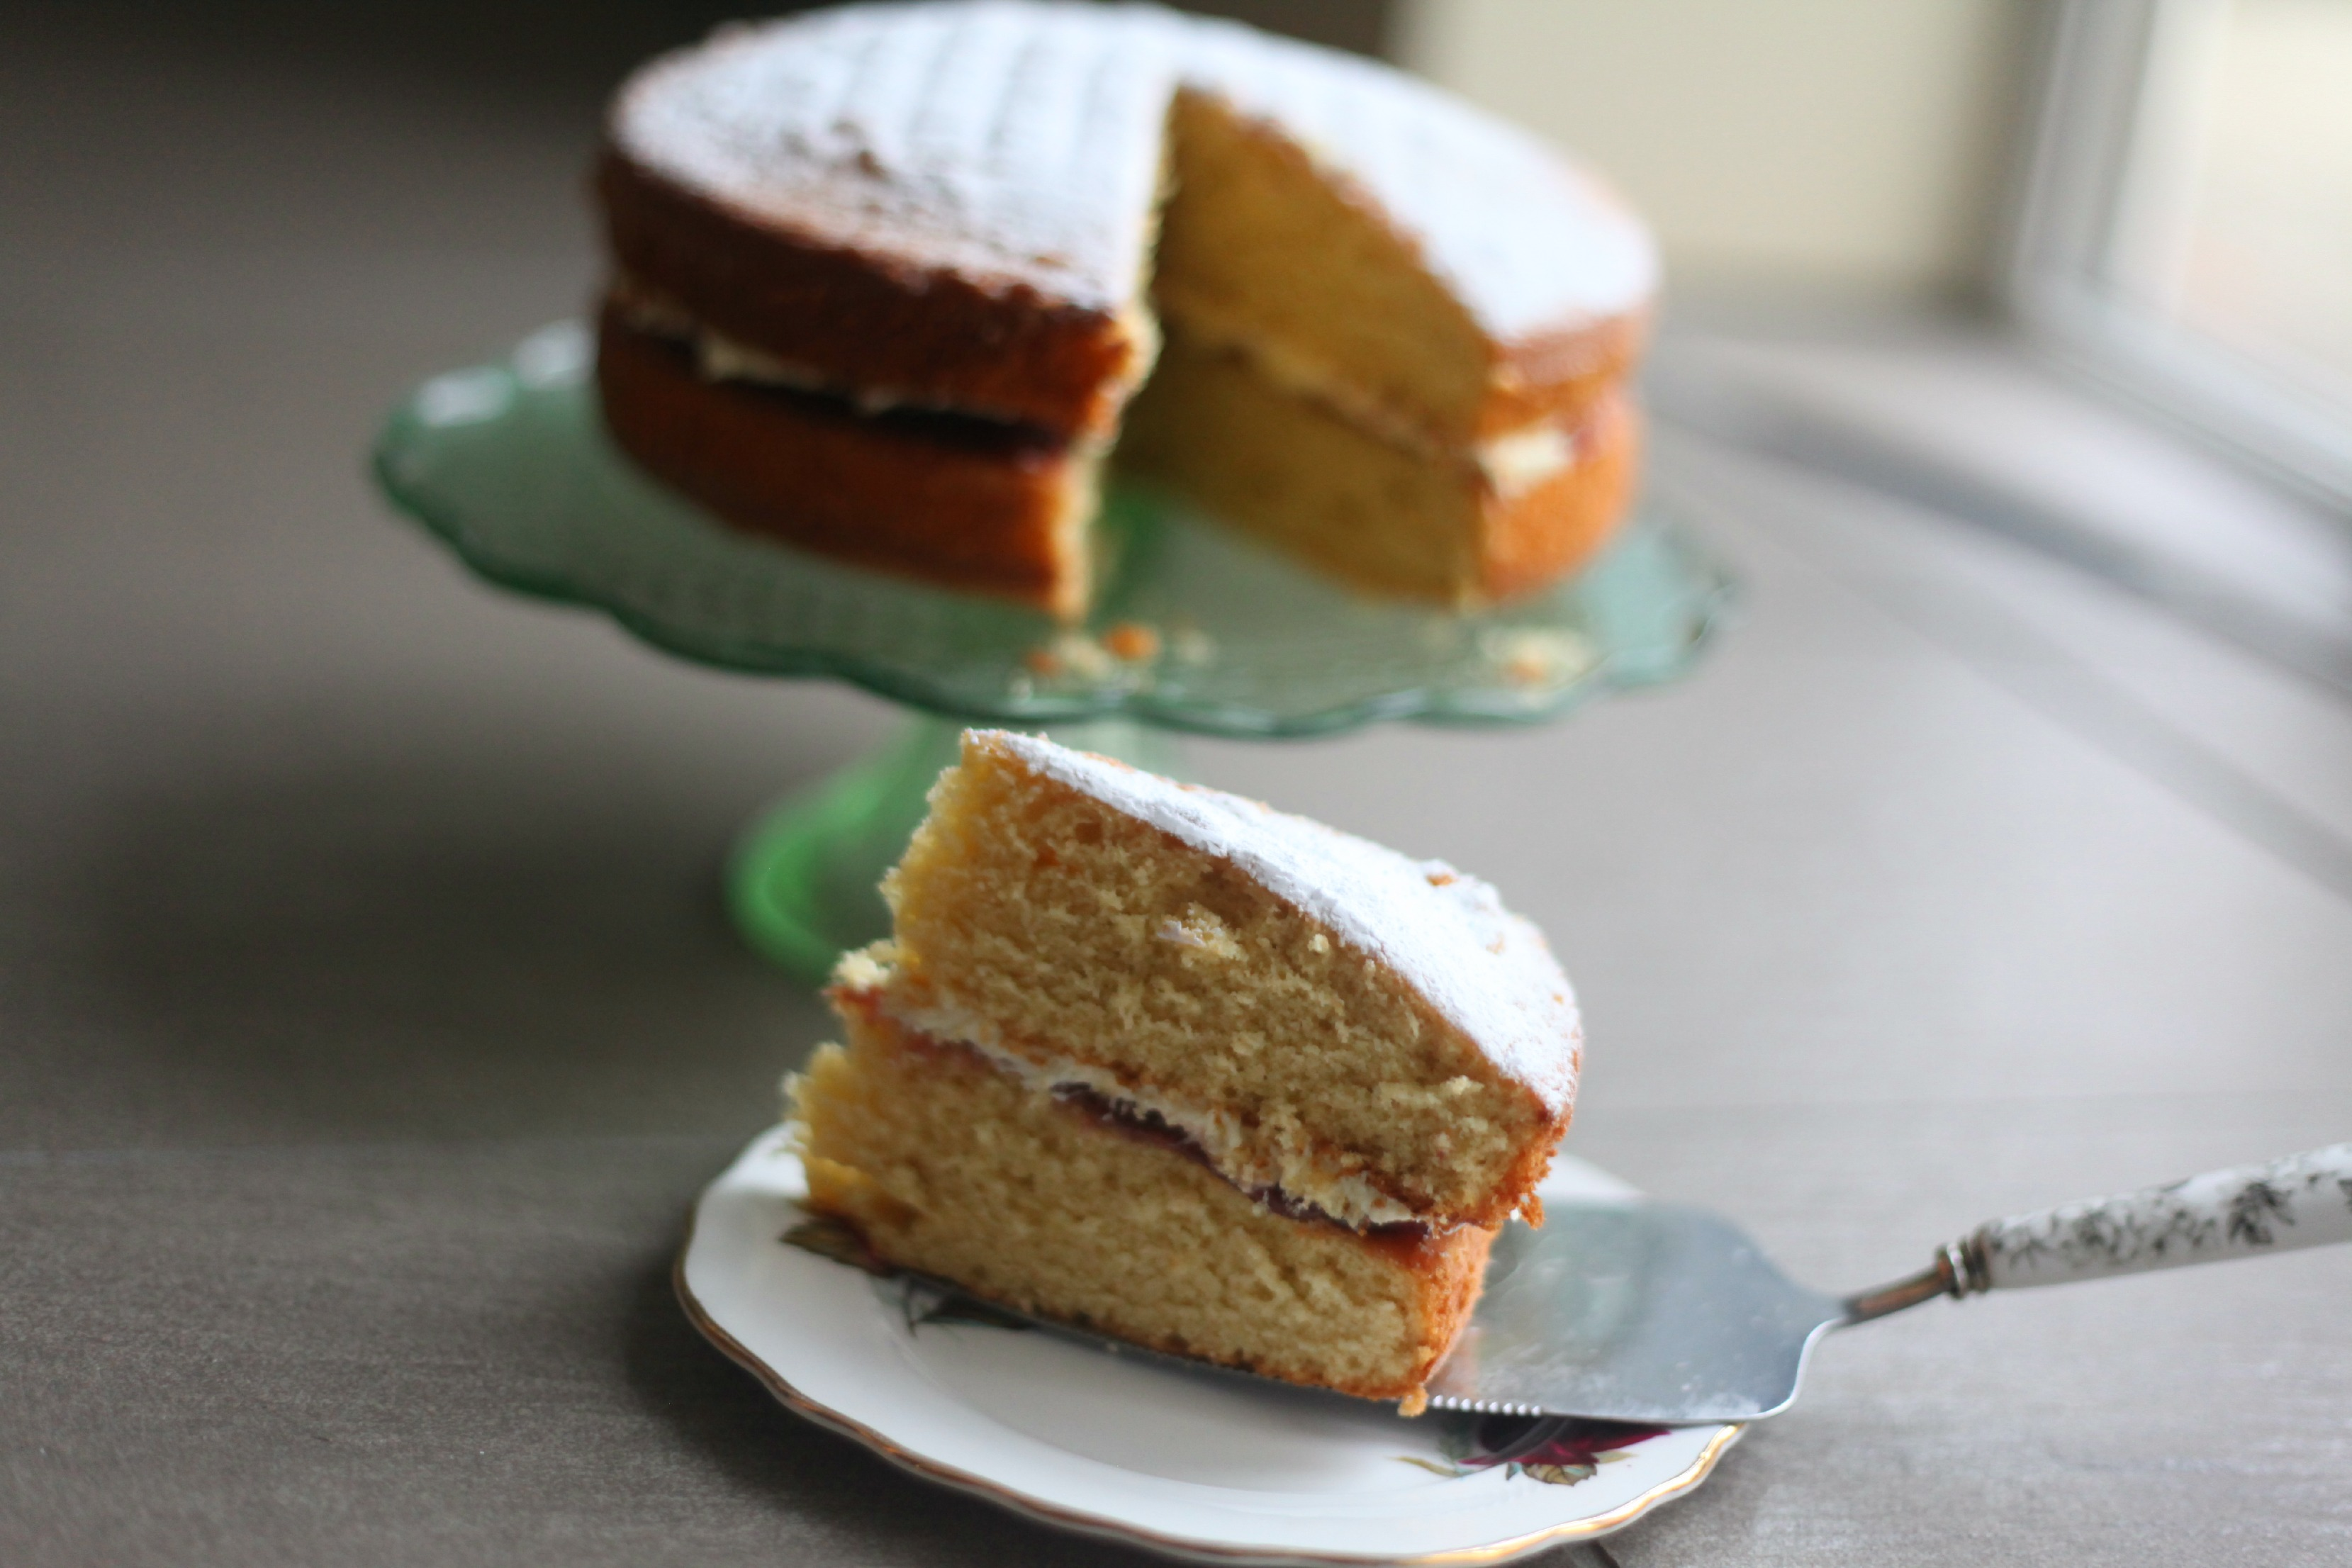 Ginger Cake with a Rhubarb & Custard Jam Filling | Mummy Mishaps